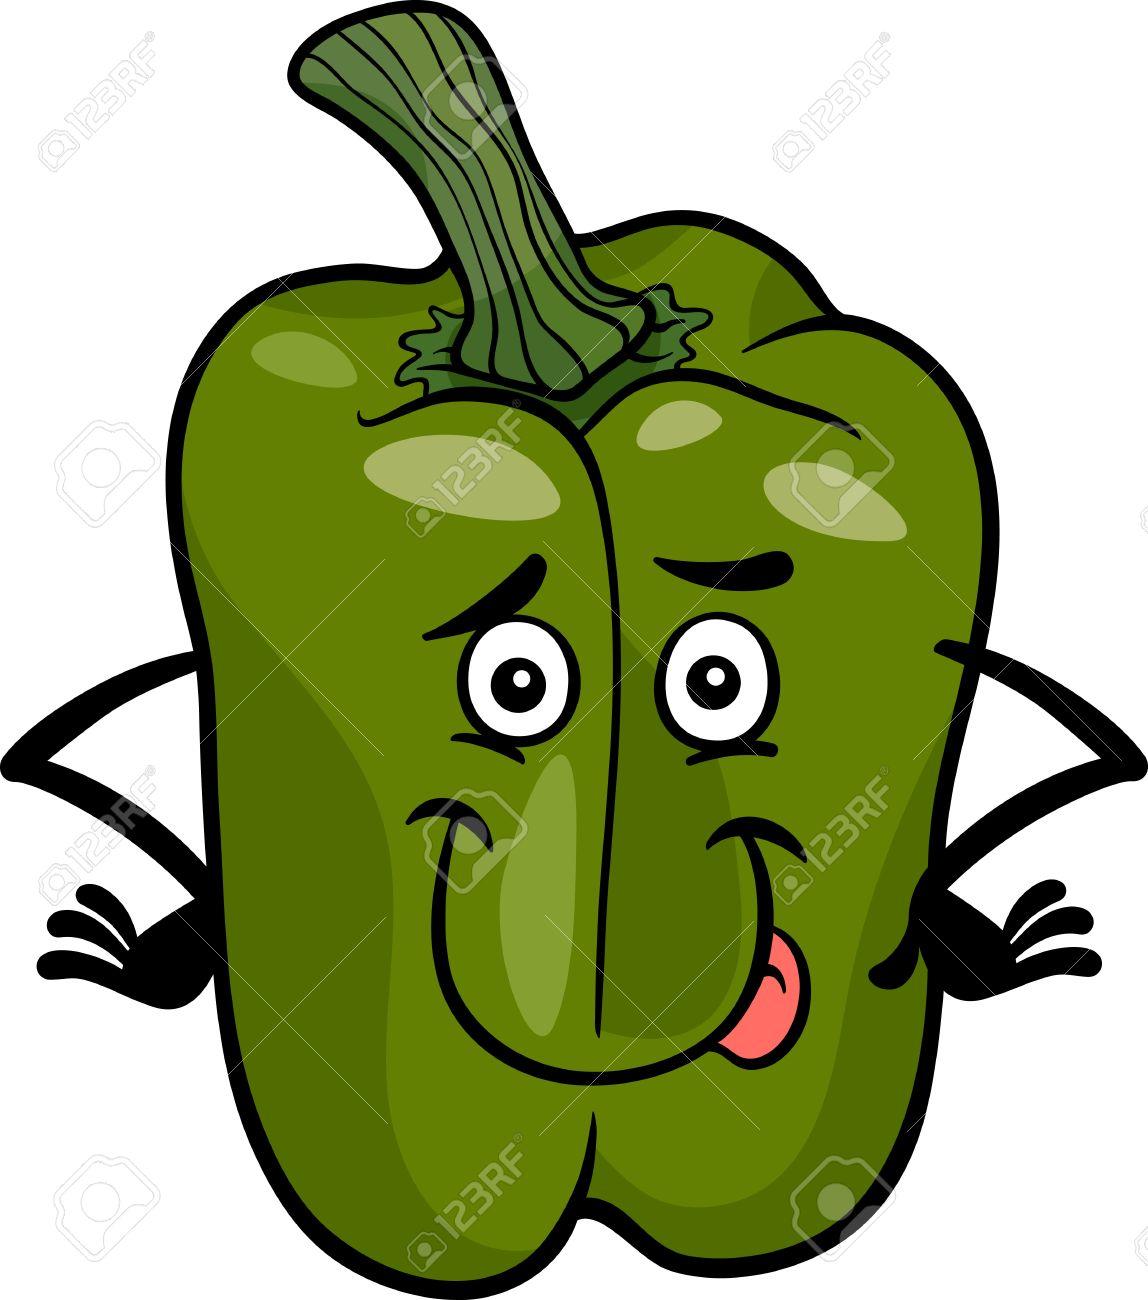 Capsicum clipart green leafy vegetable Vector Cartoon Pinterest Funny Vegetable